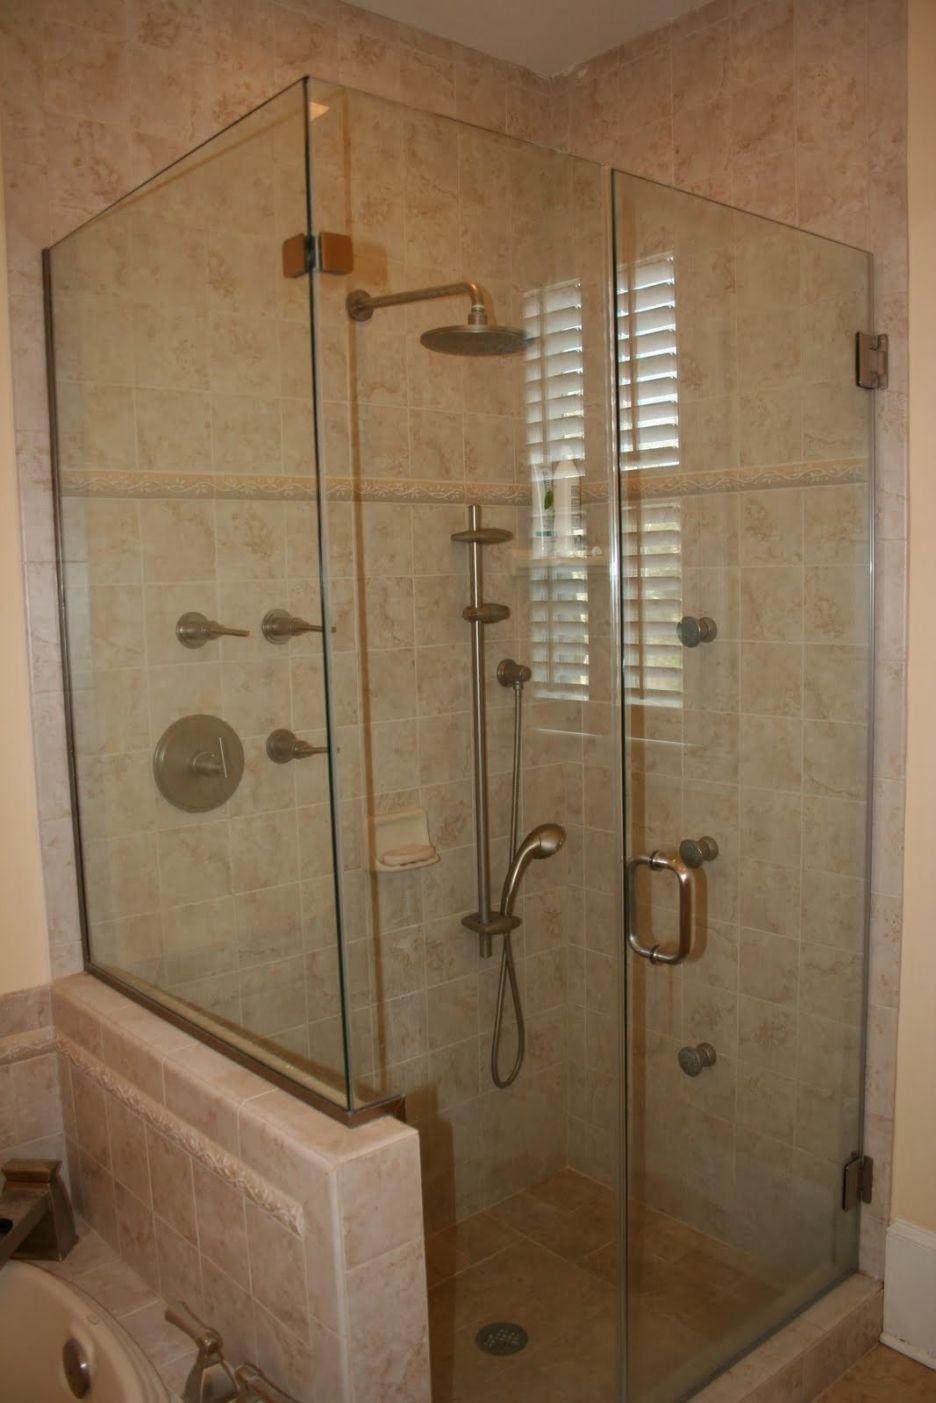 Bathroom, : Exquisite Frameless Glass Shower Door And Fixed Round ...